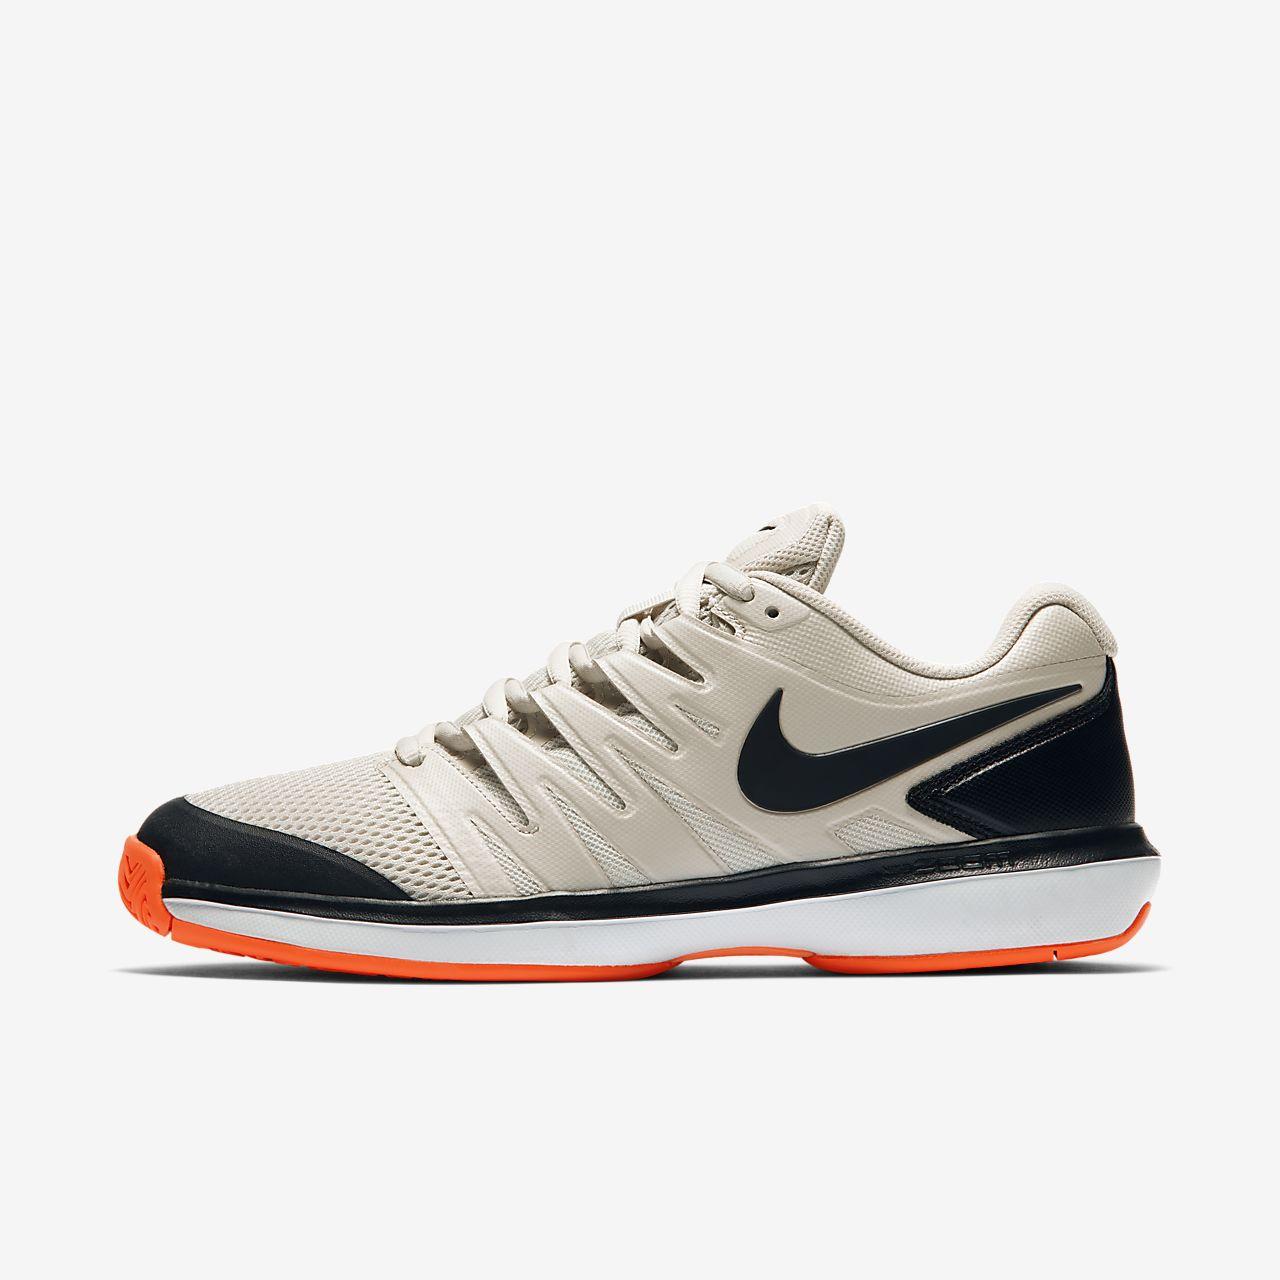 scarpe tennis donna nike alte